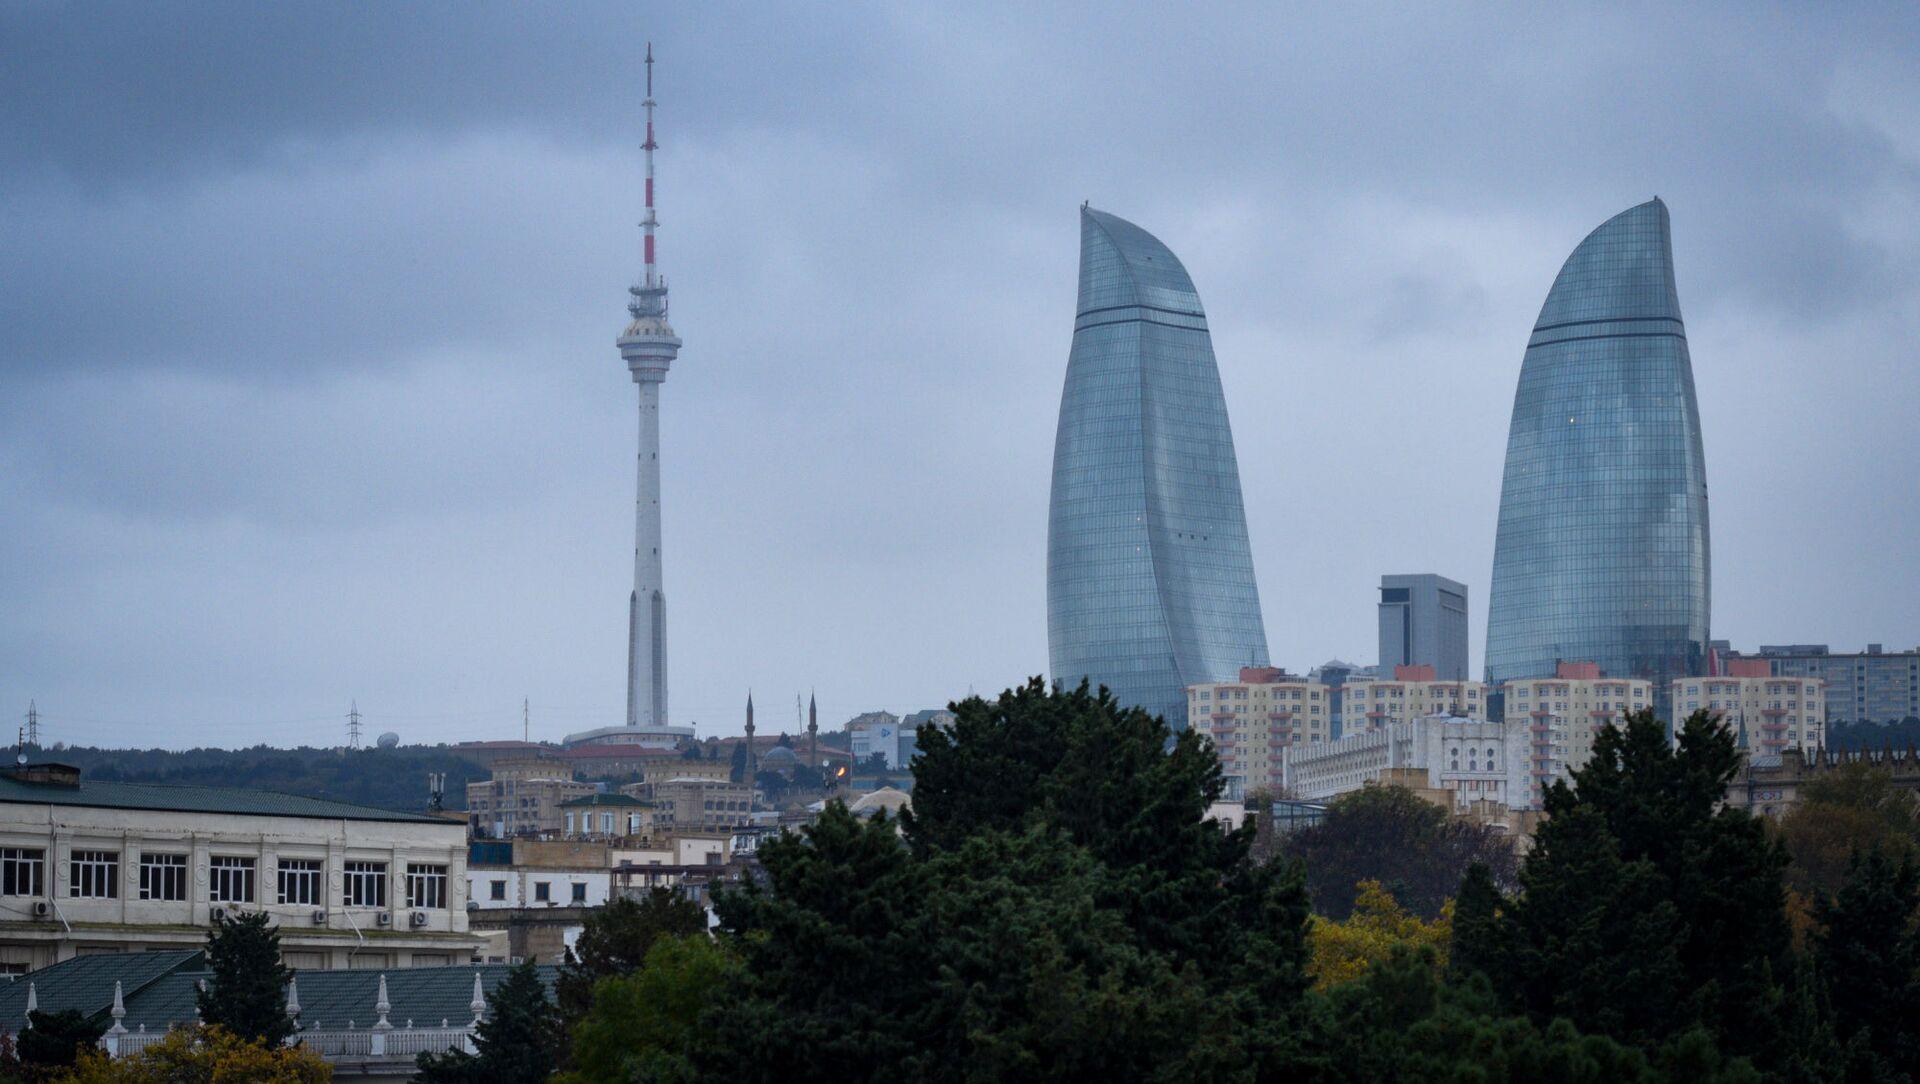 Вид на телебашню и Flame Towers в Баку - Sputnik Азербайджан, 1920, 22.09.2021